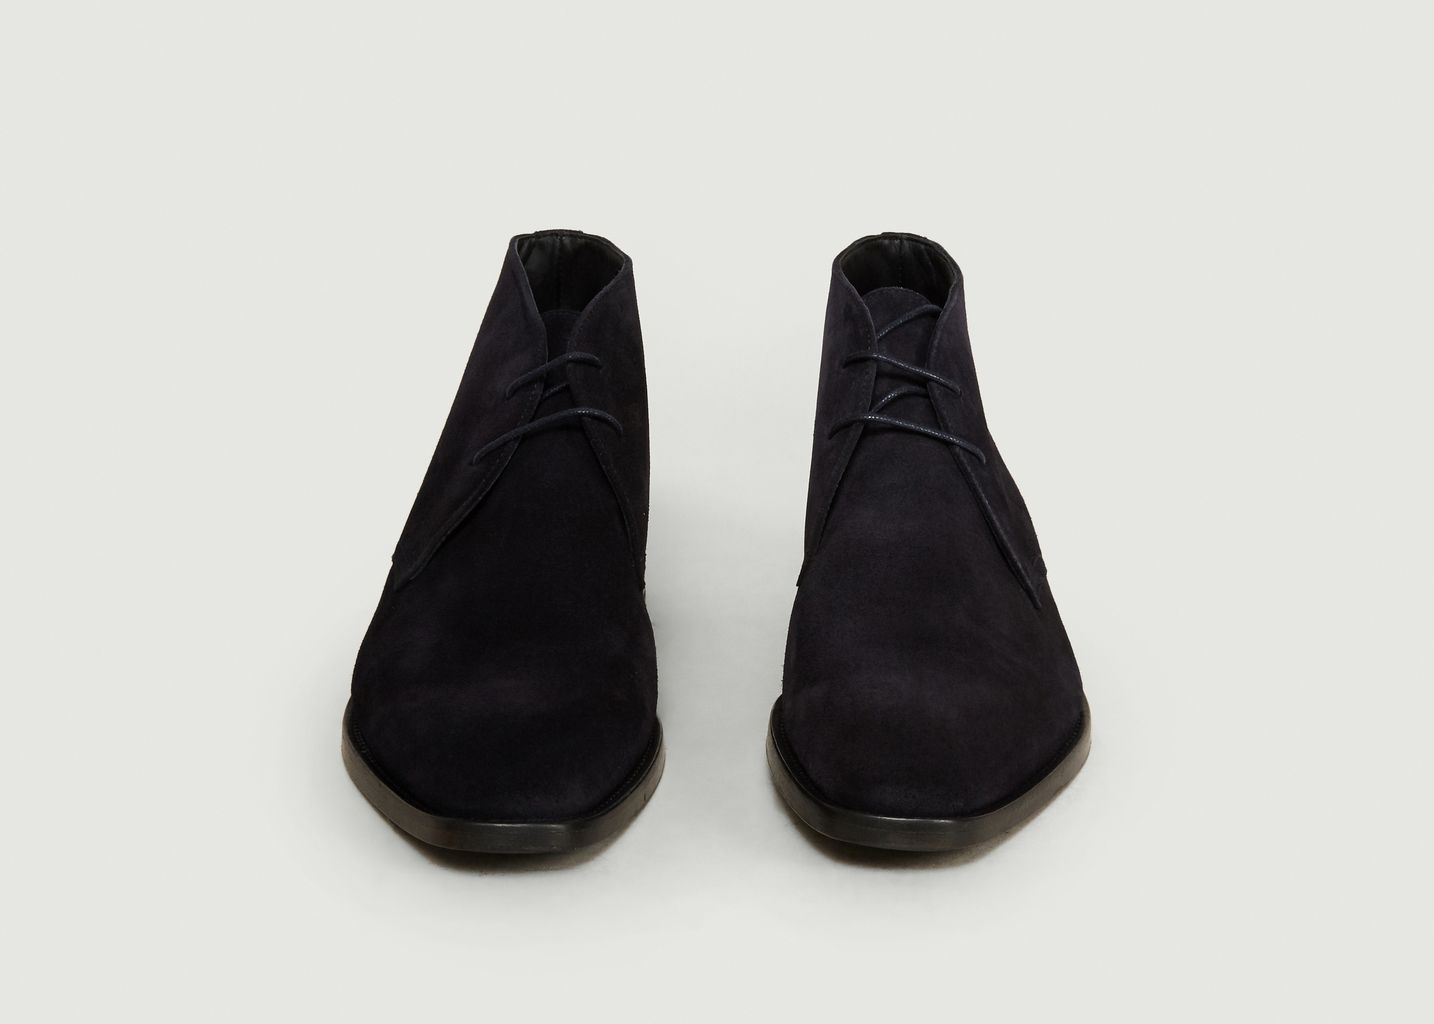 Boots Chukka Arni - PS by PAUL SMITH